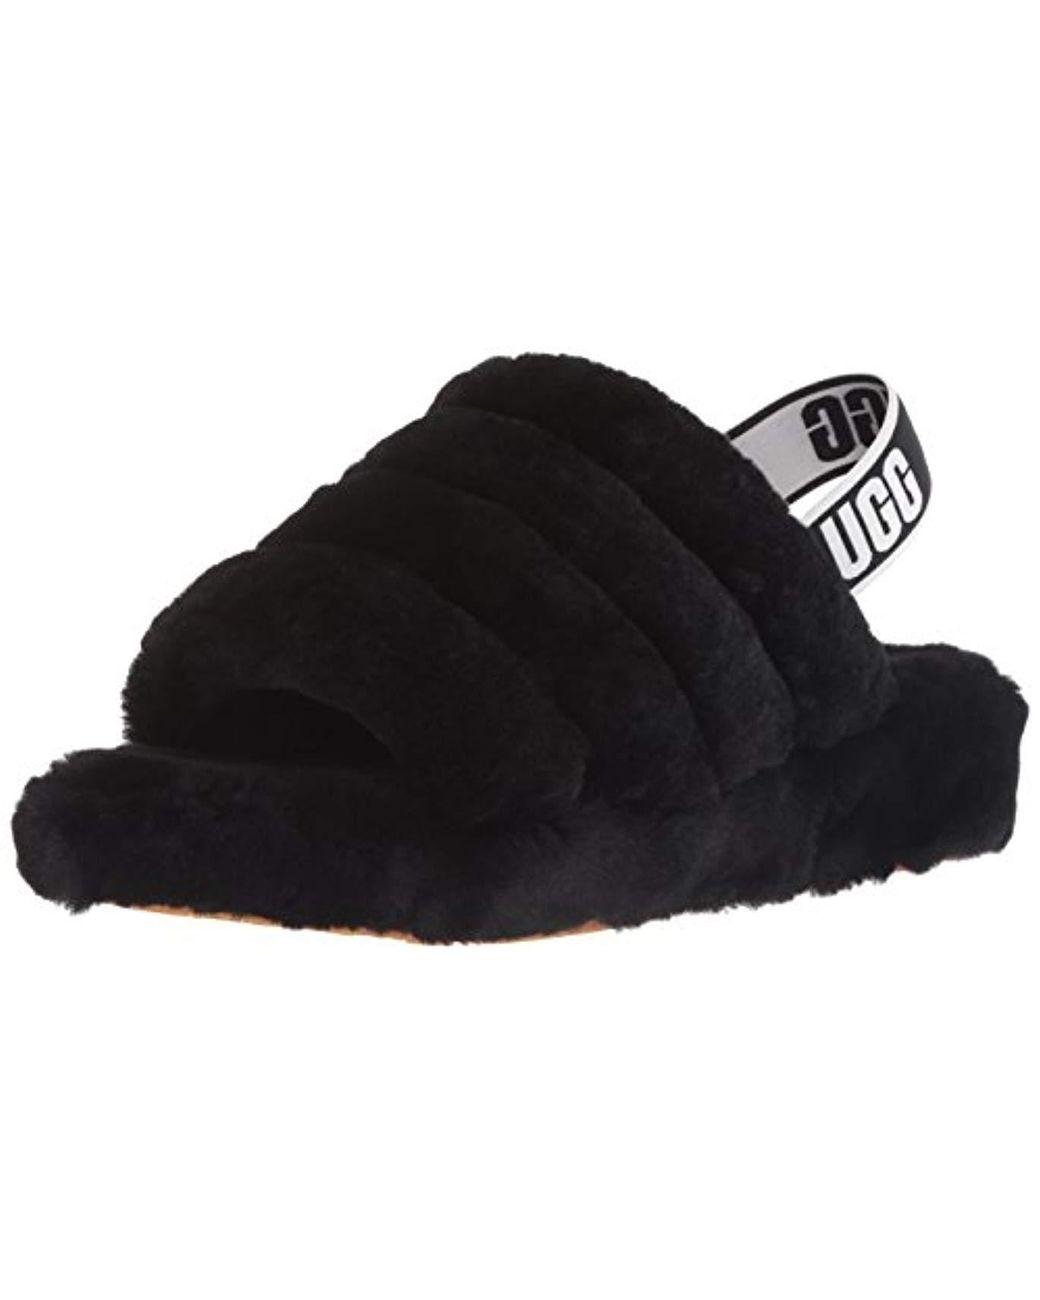 f7e2b4614 UGG Women's Fluff Yeah Logo Slide in Black - Save 38% - Lyst